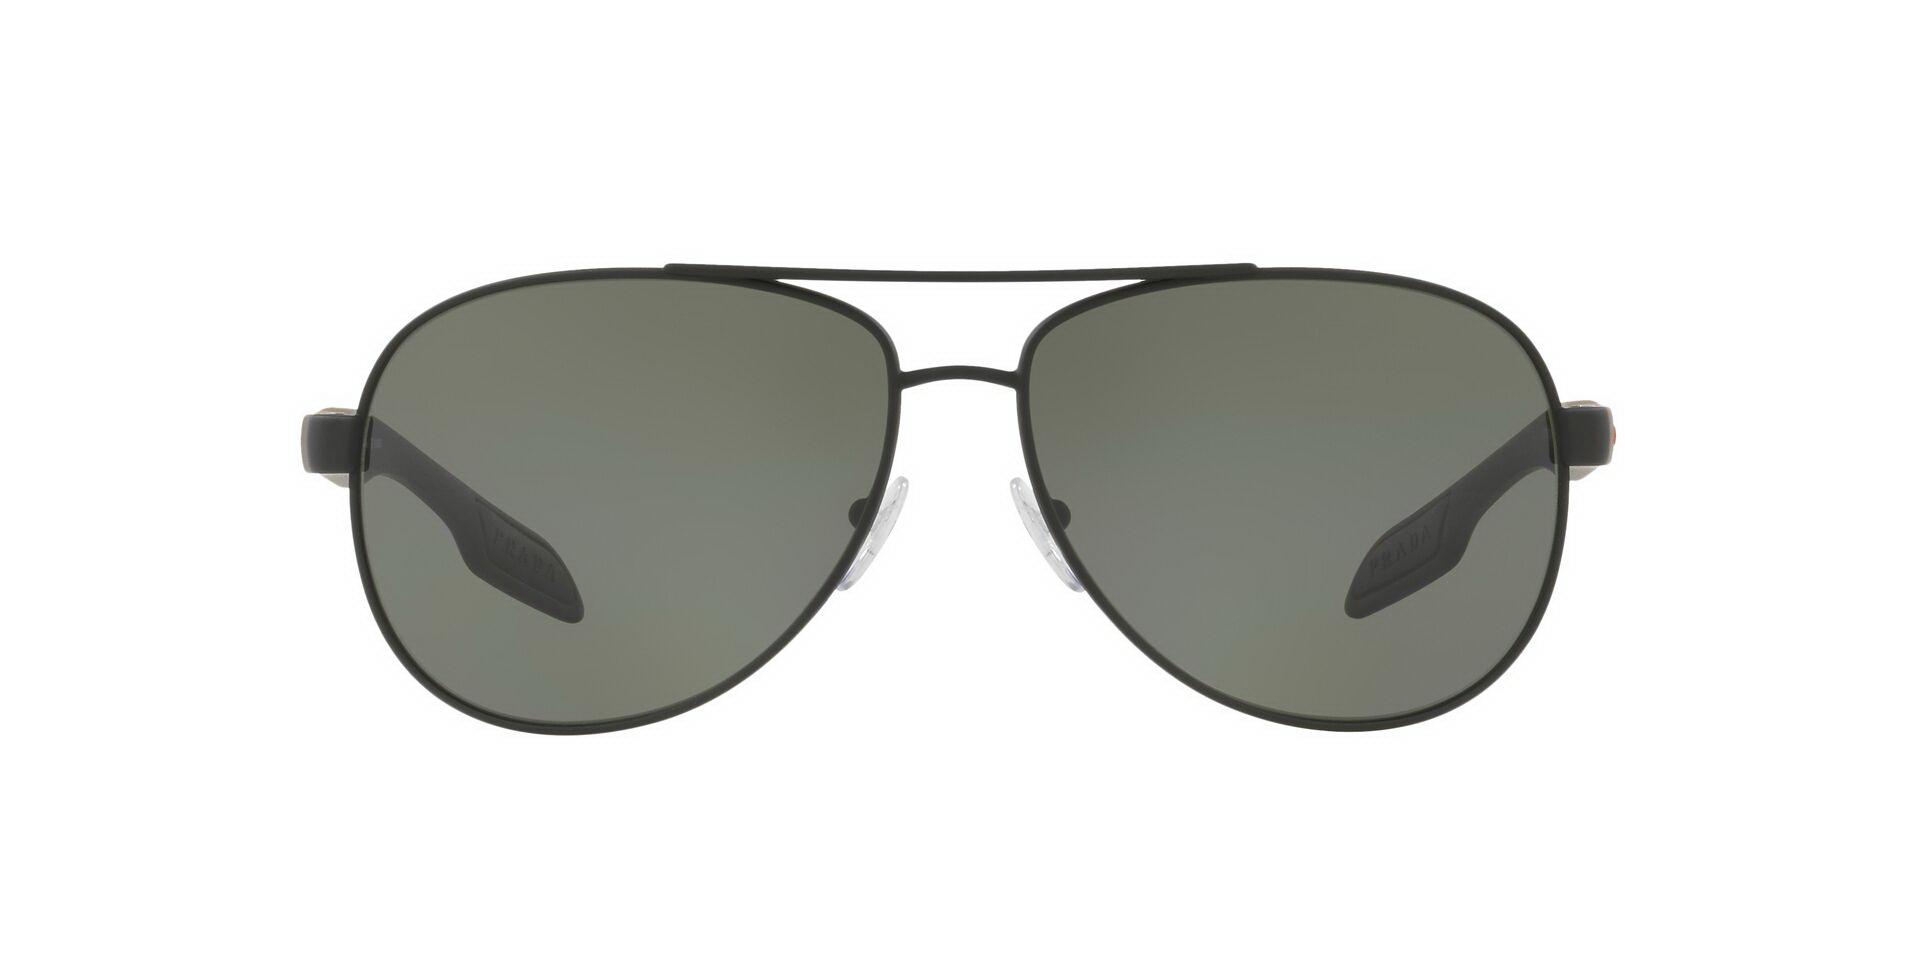 Солнцезащитные очки Очки с/з PRADA LINEA ROSSA 0PS53PS DG05X1